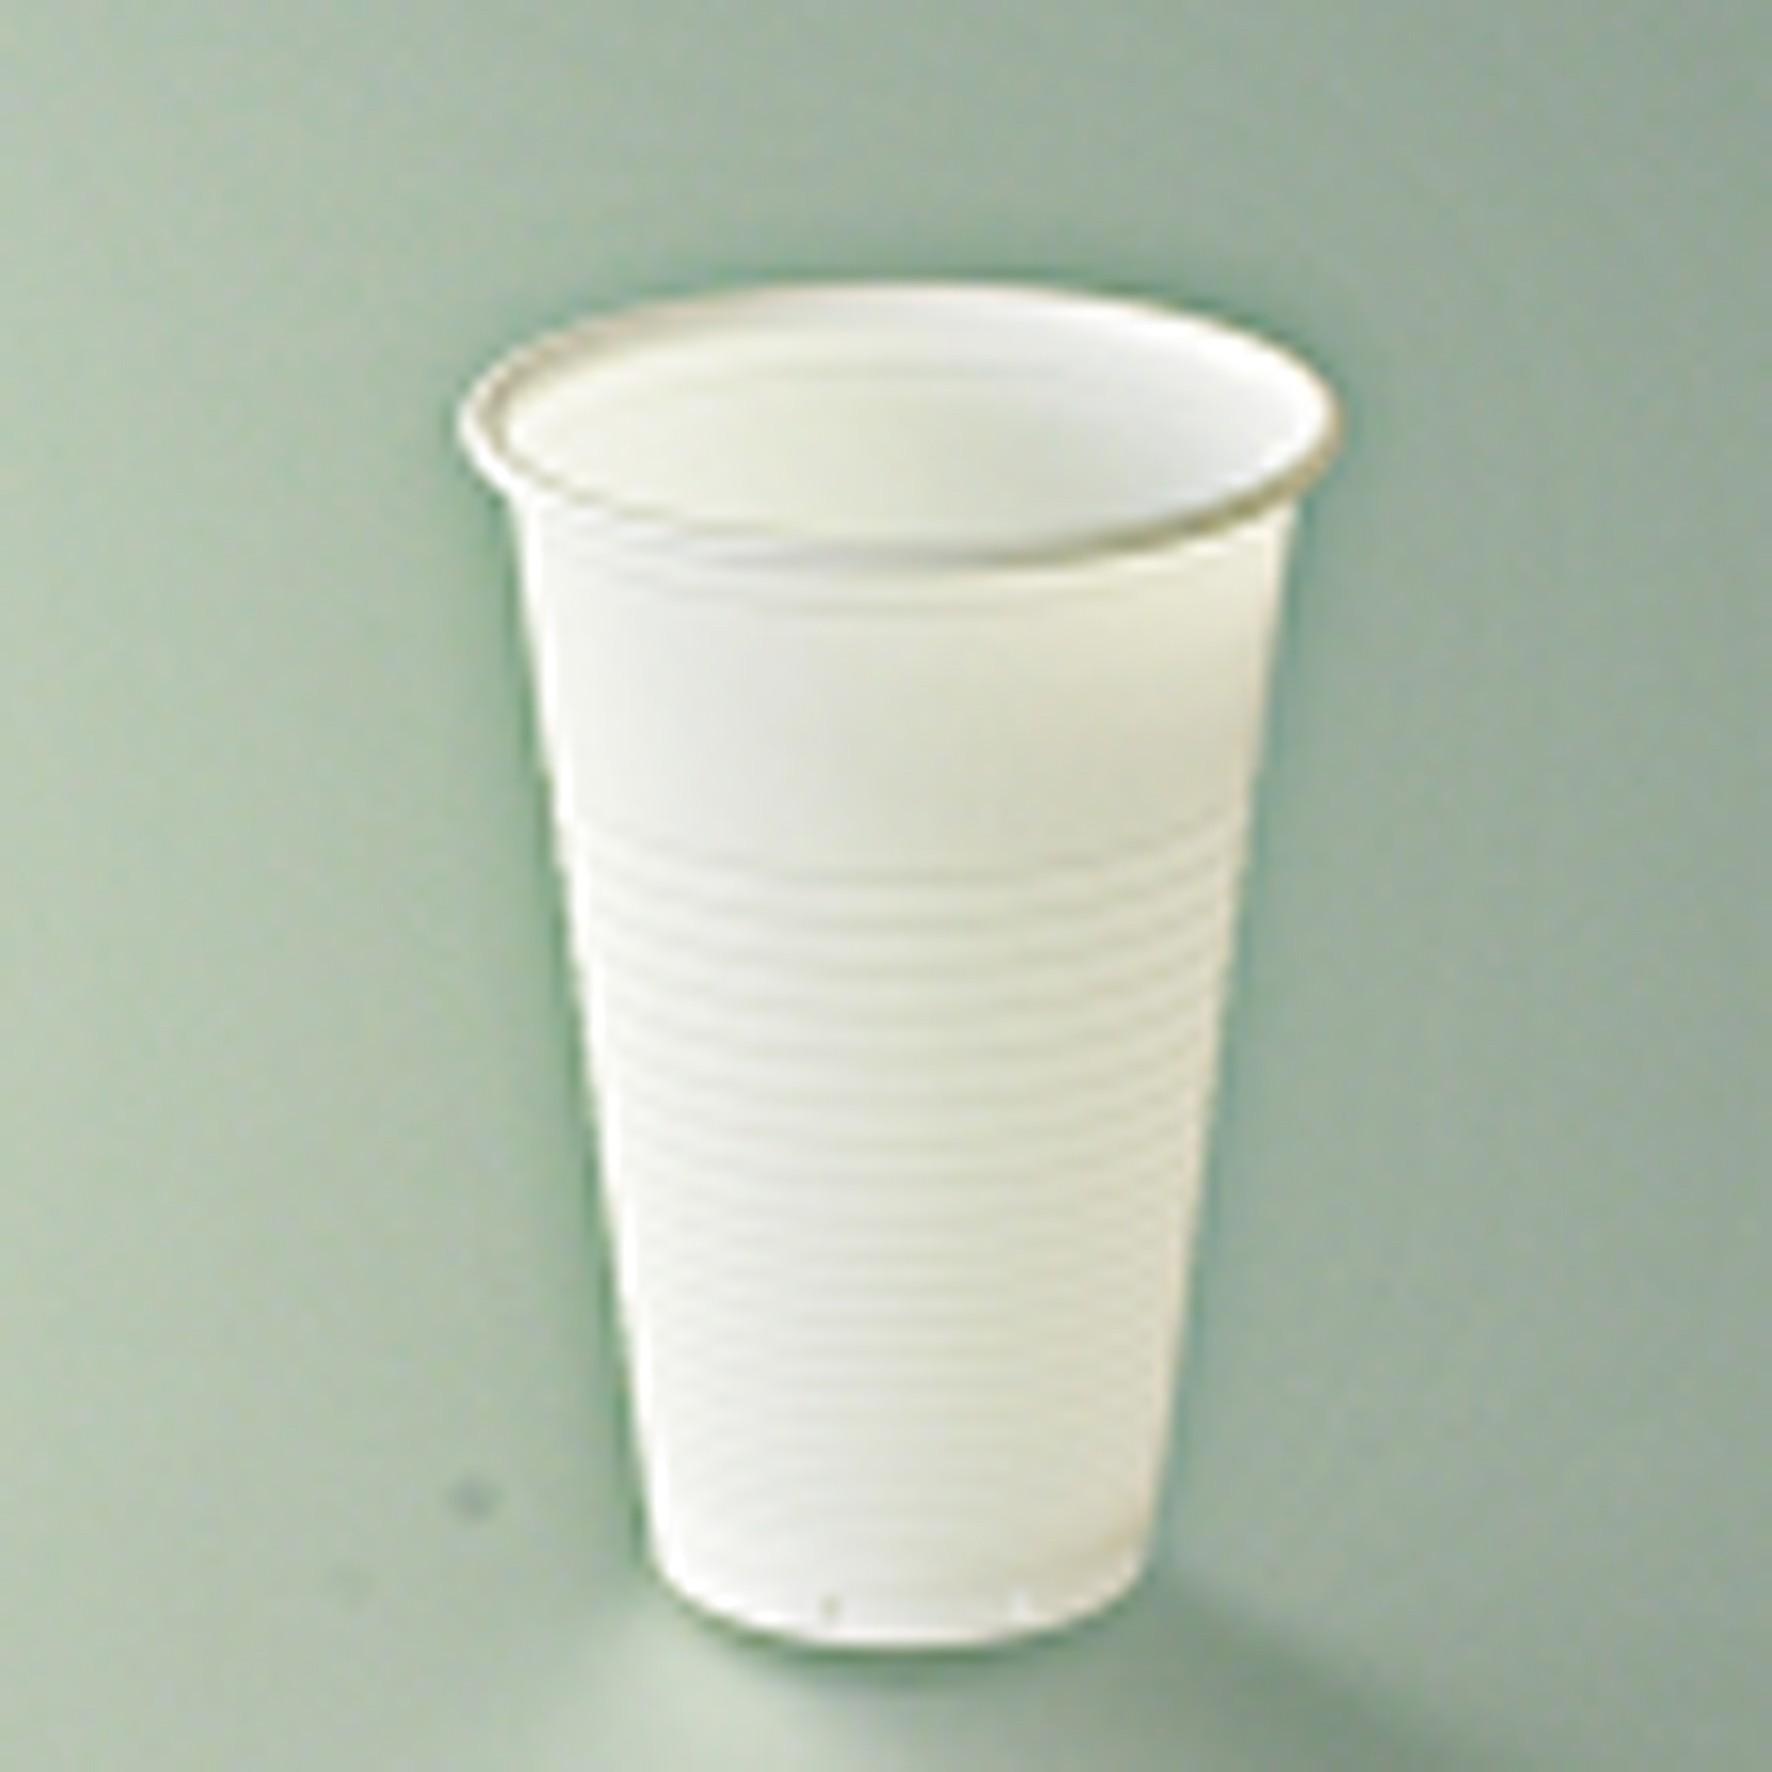 Gobelet blanc strié polypro